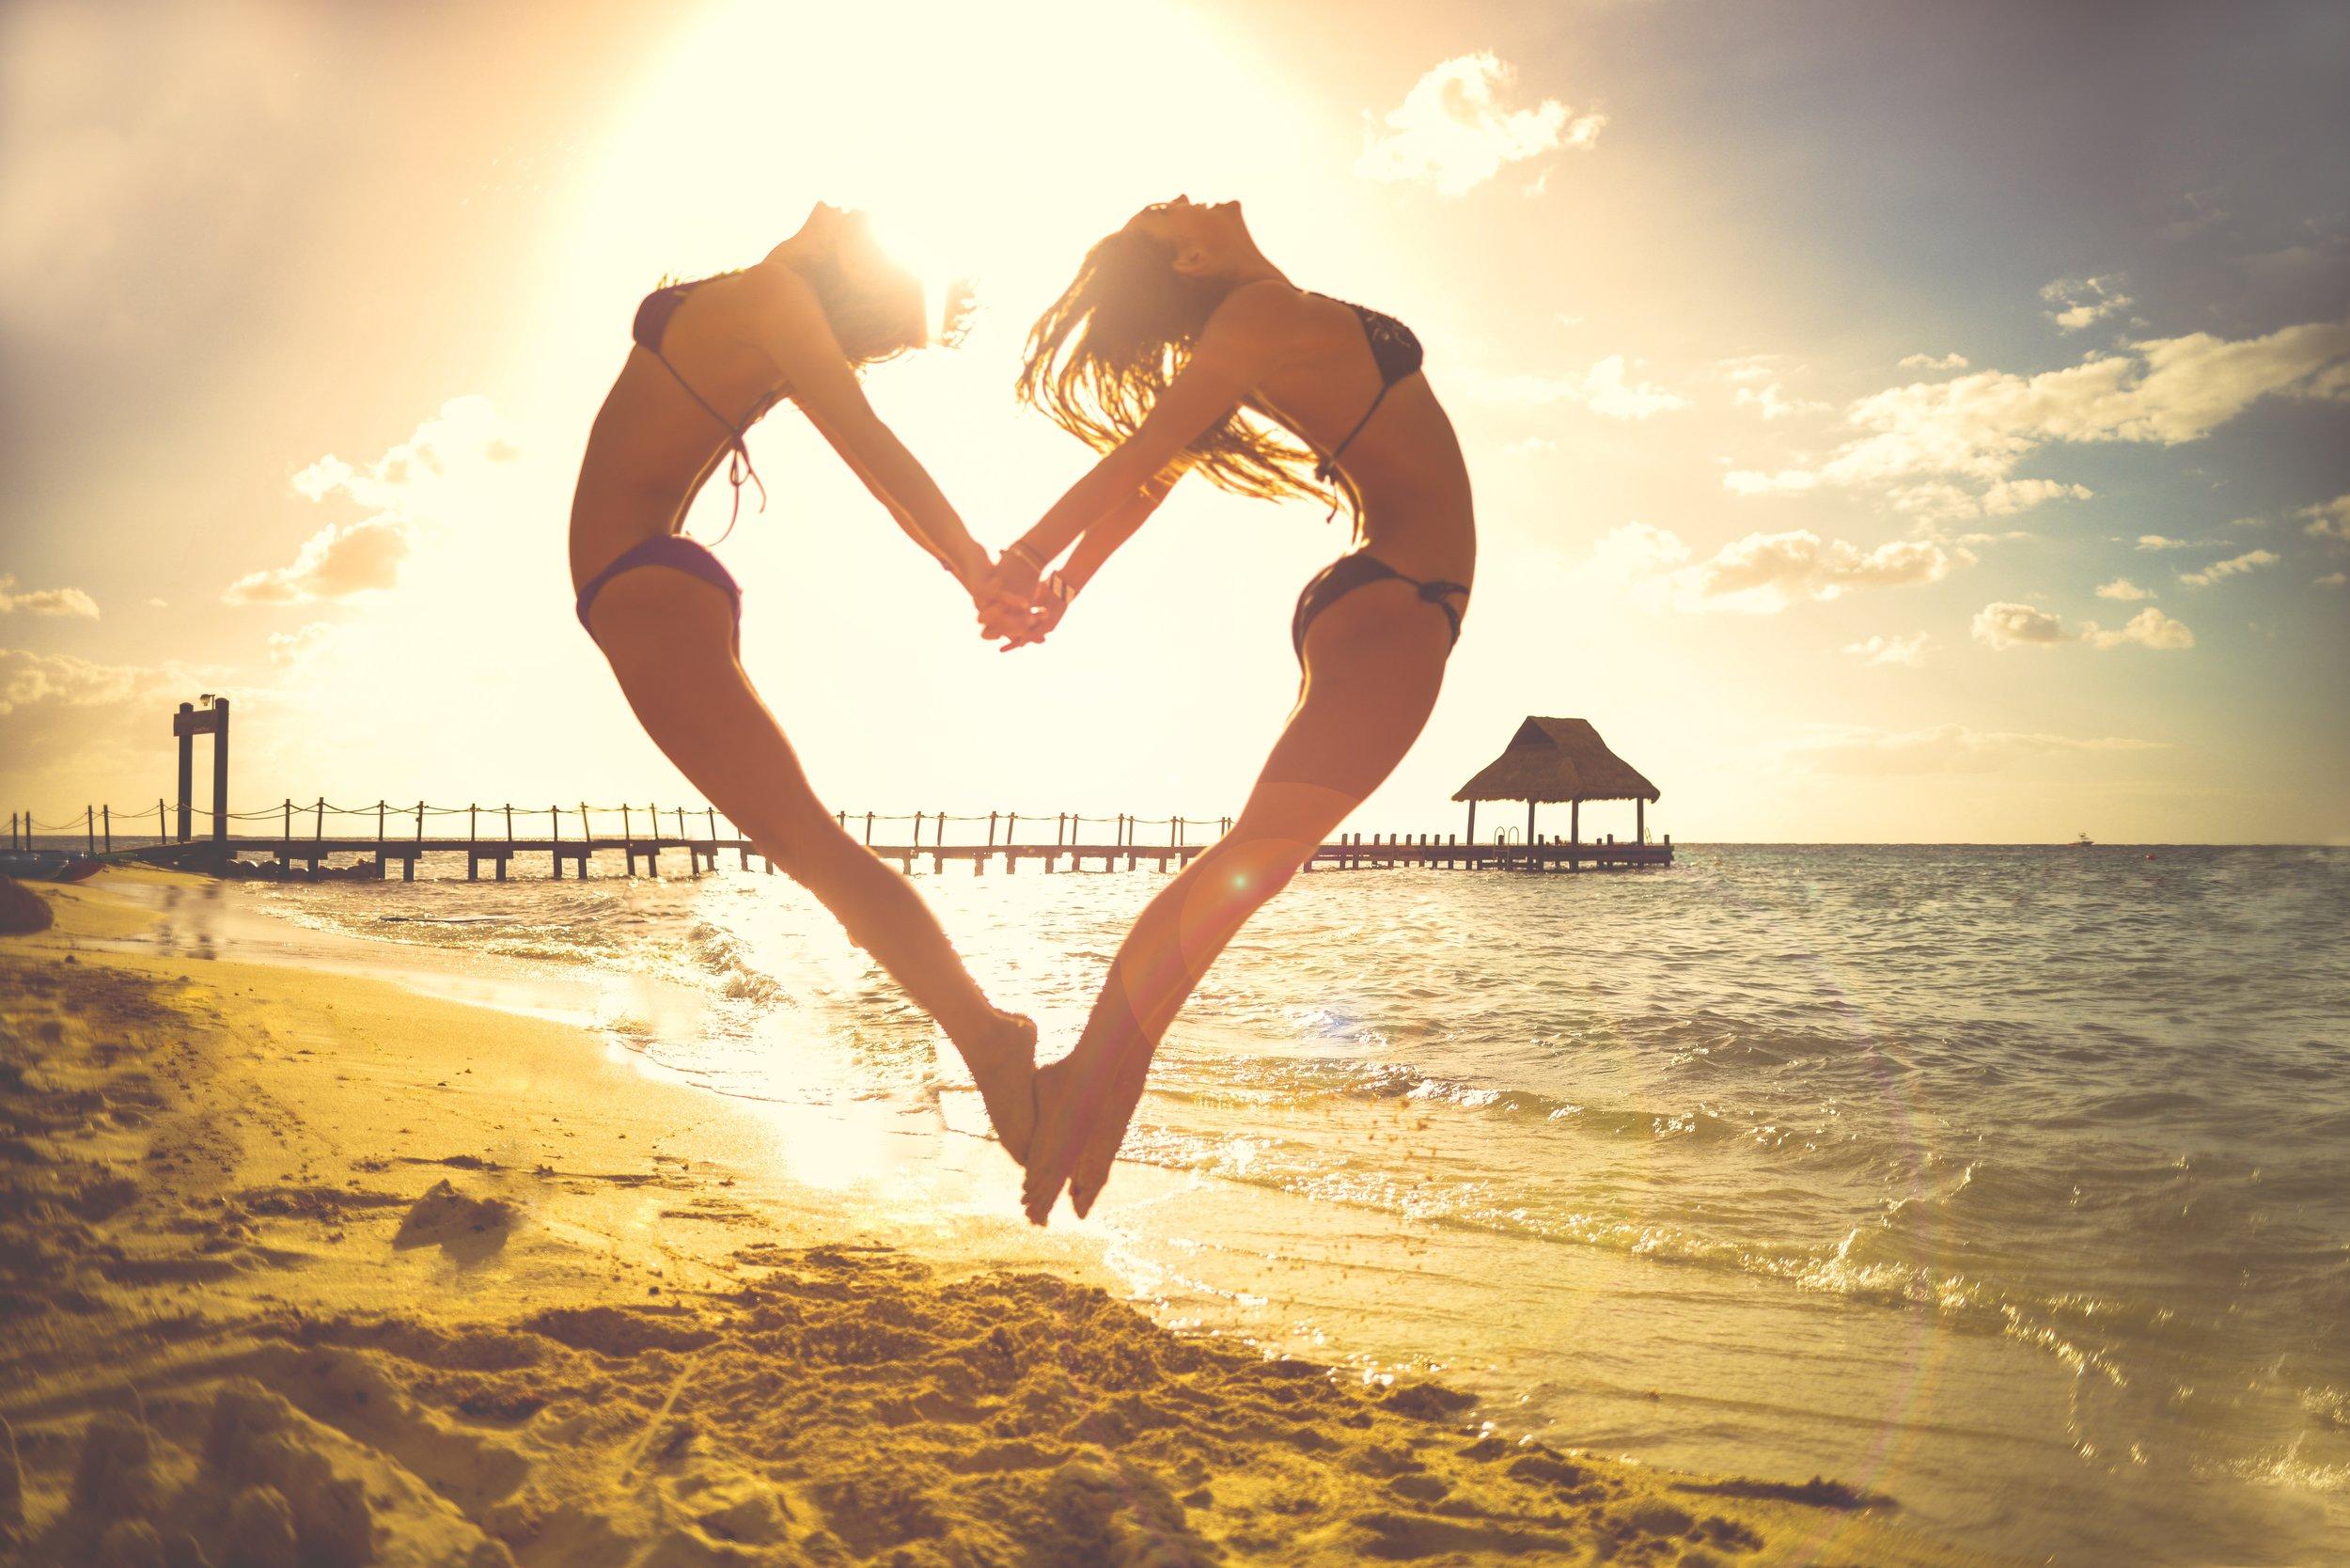 beach-beautiful-fun-5358.jpg